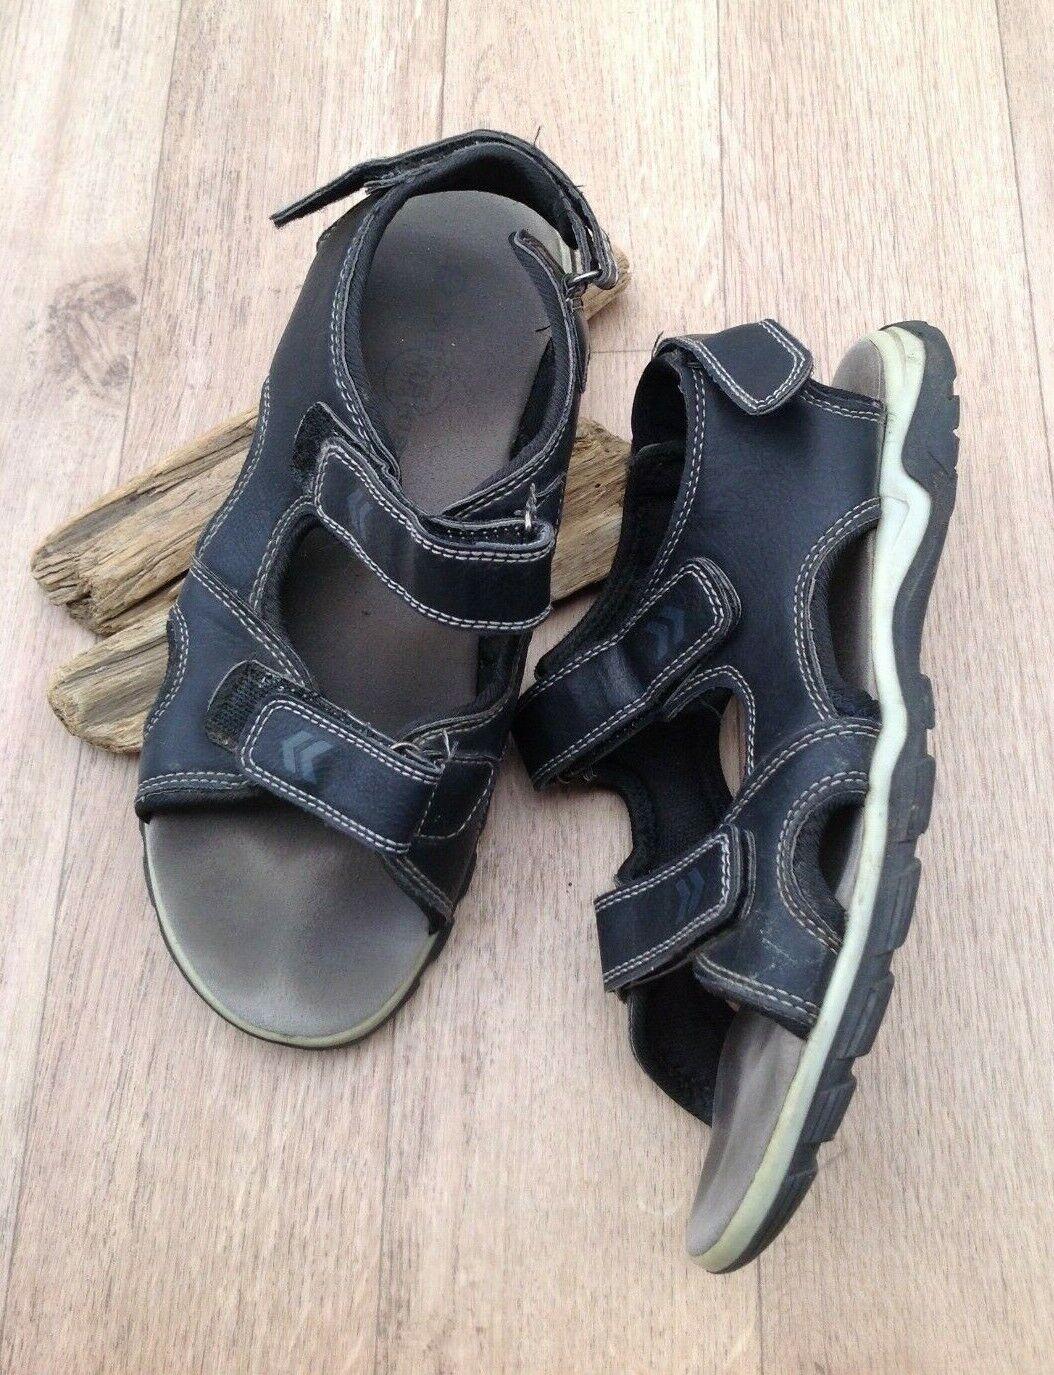 Mens Walking Outdoor Holiday Sandals Size 6 Memphis camping caravan beach summer